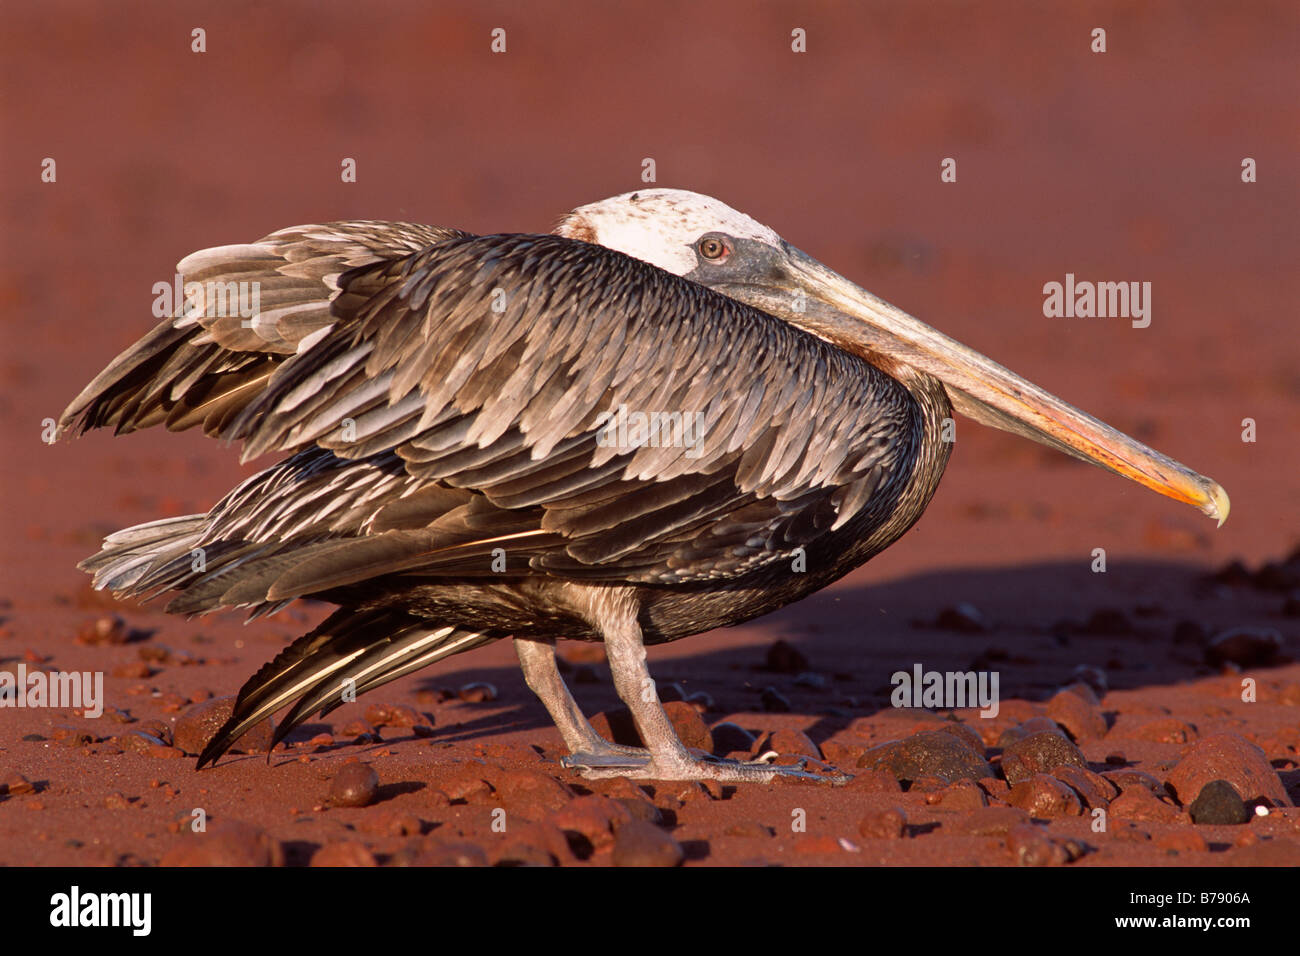 Brown Pelican (Pelecanus occidentalis) on Insel Rapida red beach, Galapagos Inseln, Galapagos Islands, Ecuador, - Stock Image